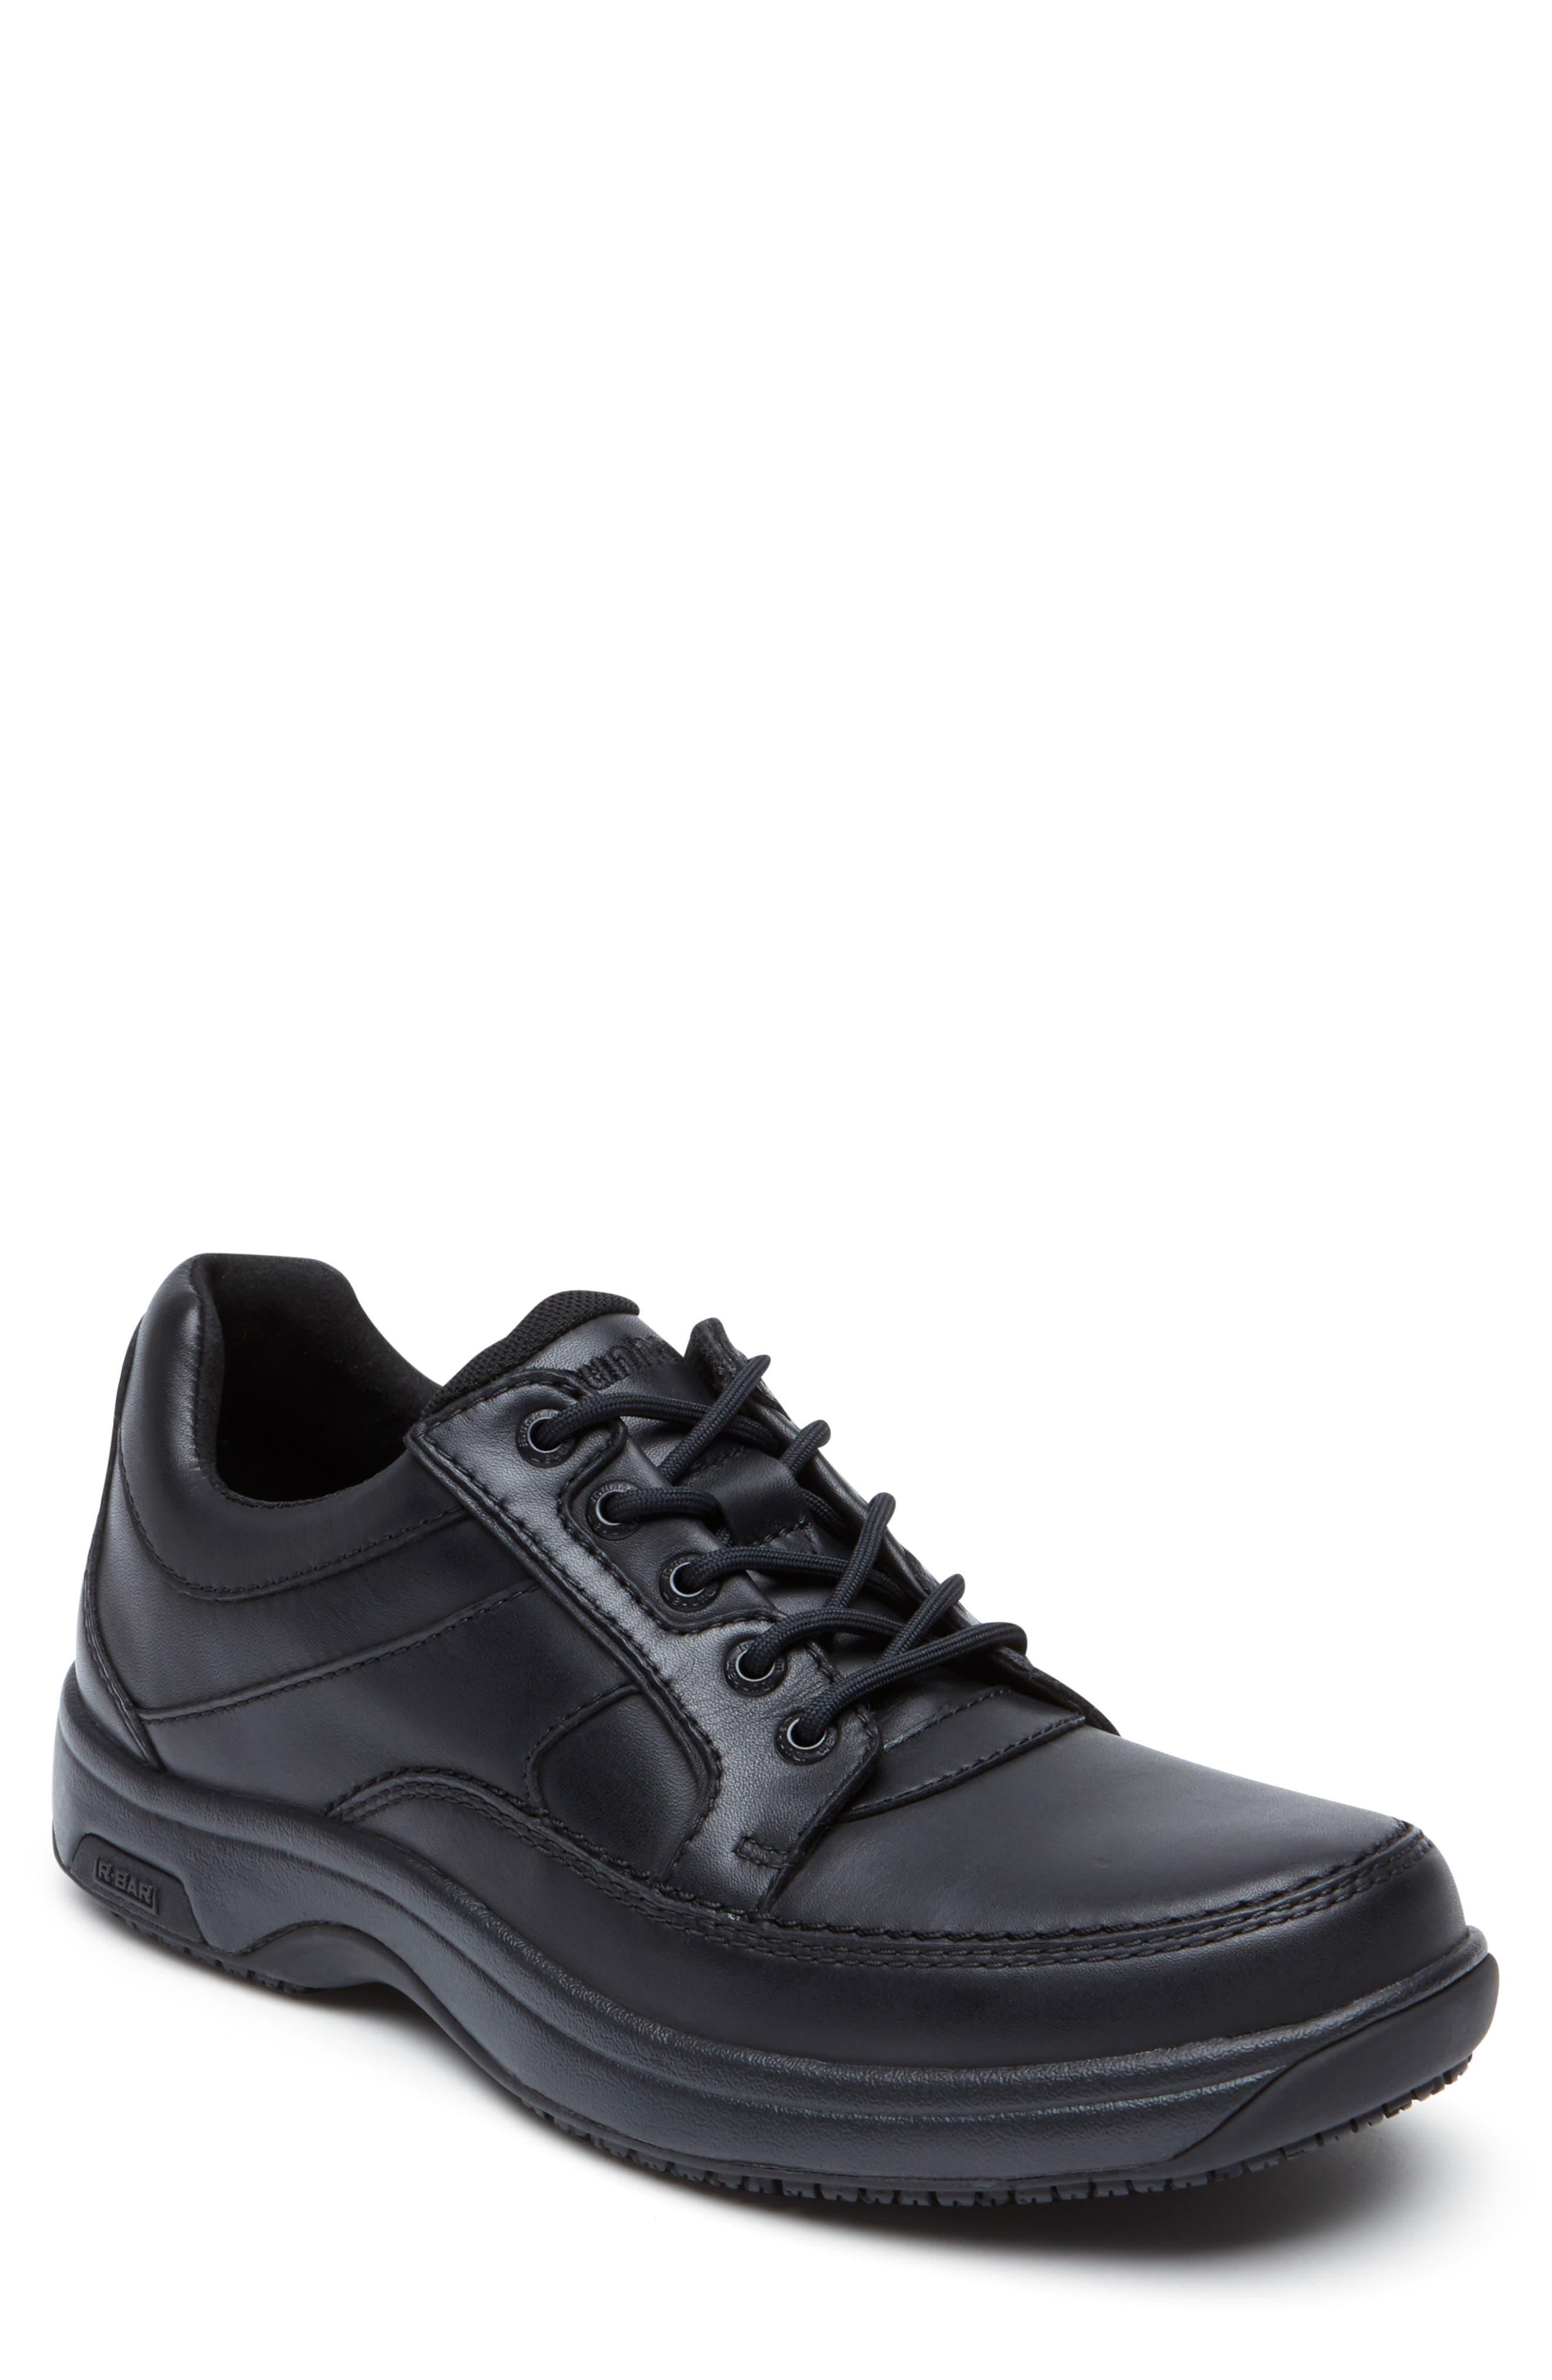 DUNHAM 'Midland' Sneaker, Main, color, BLACK LEATHER